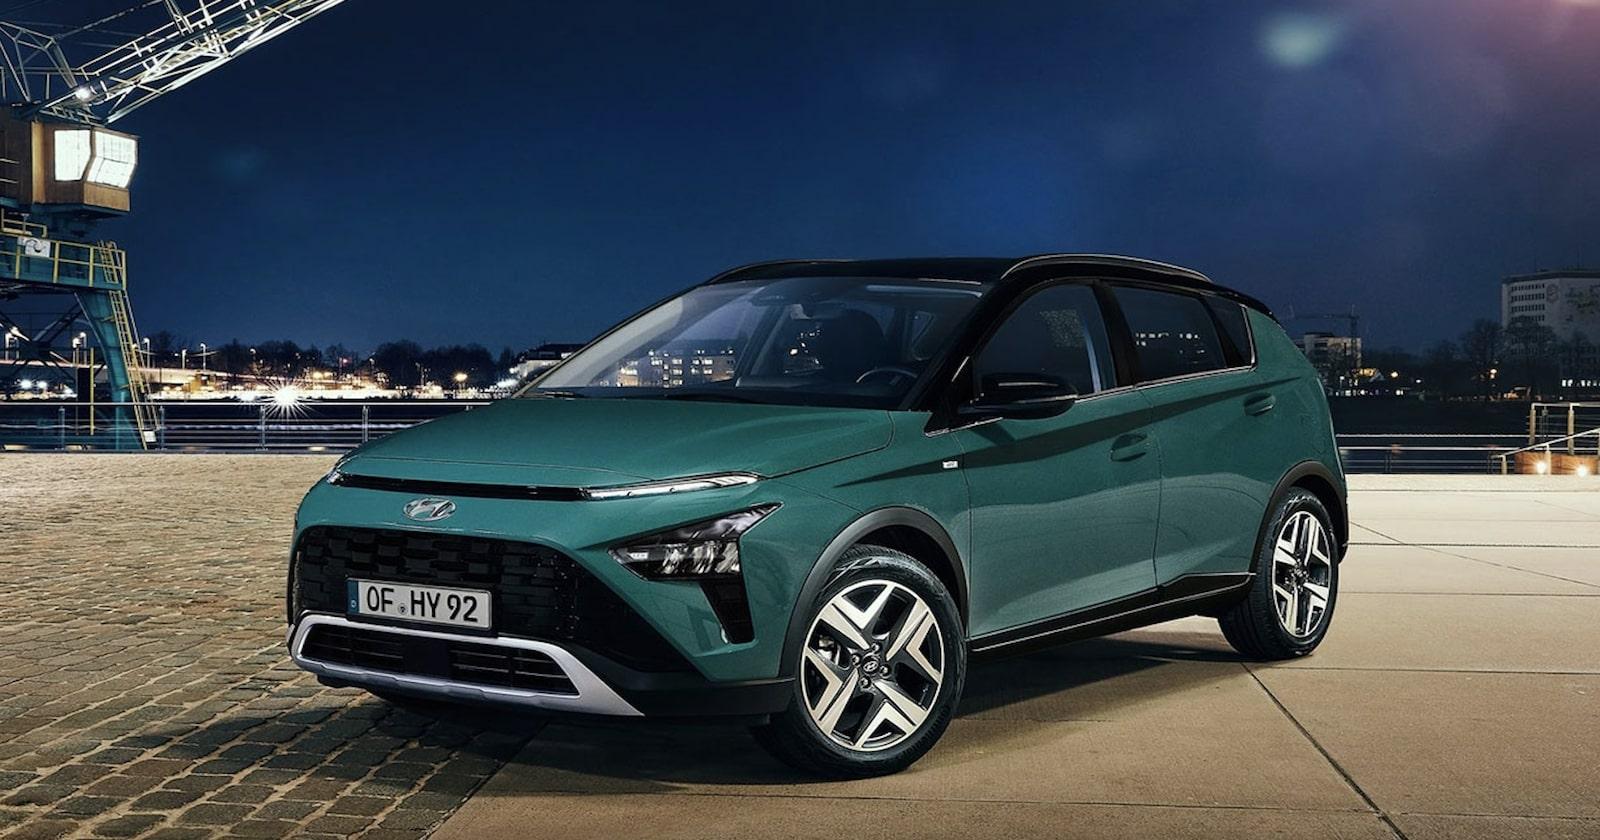 2021 Hyundai Bayon Modelinin ÖTV İndirimli Satış Fiyatları